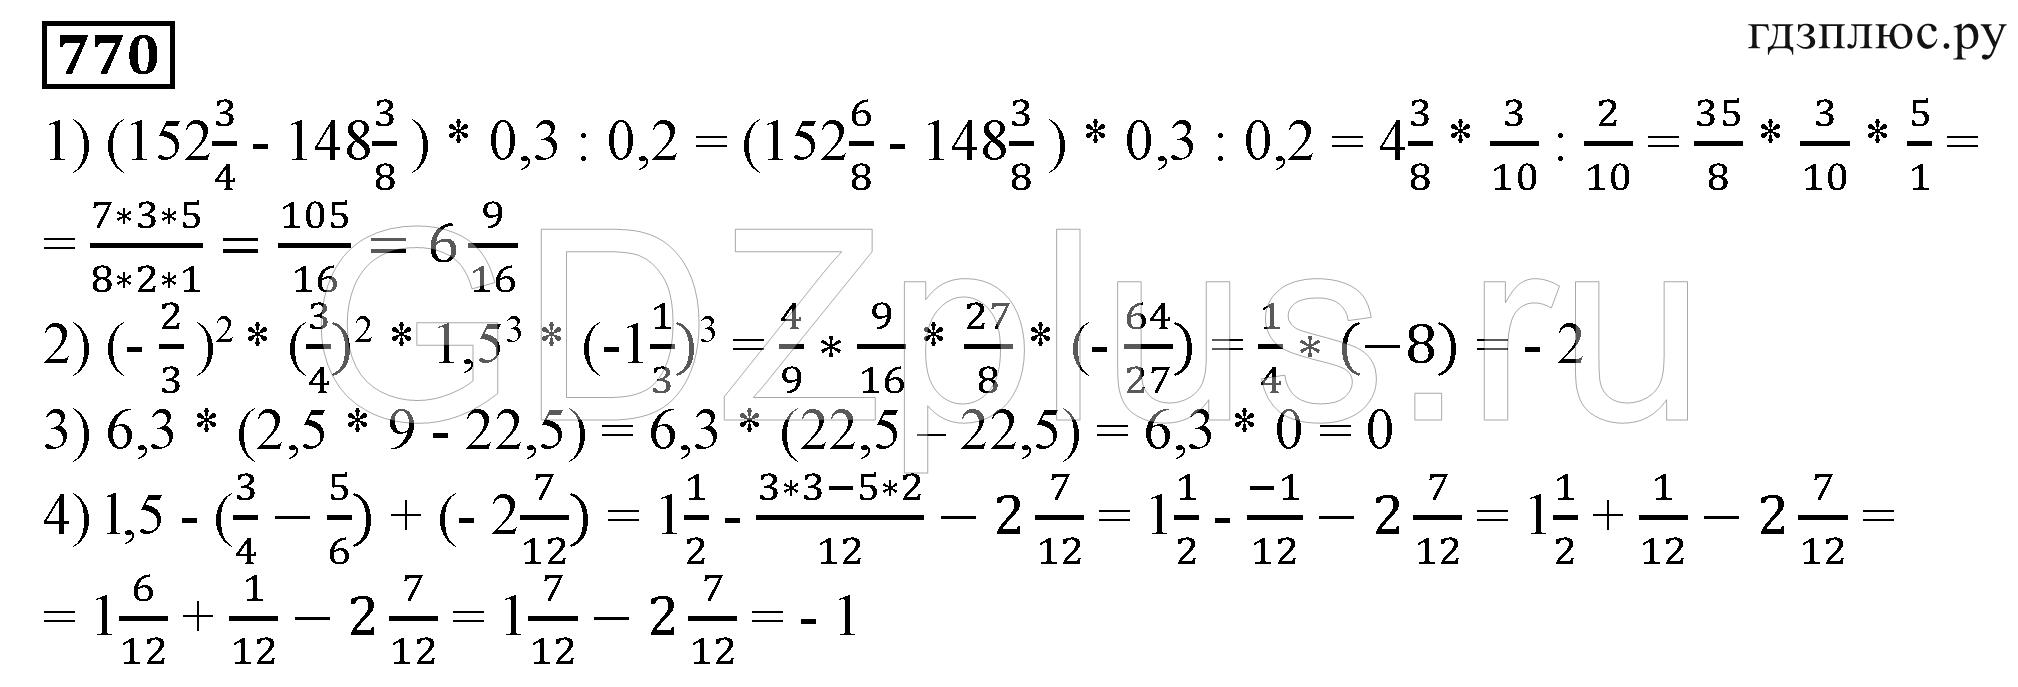 задача №770 математика 6 класс Муравин